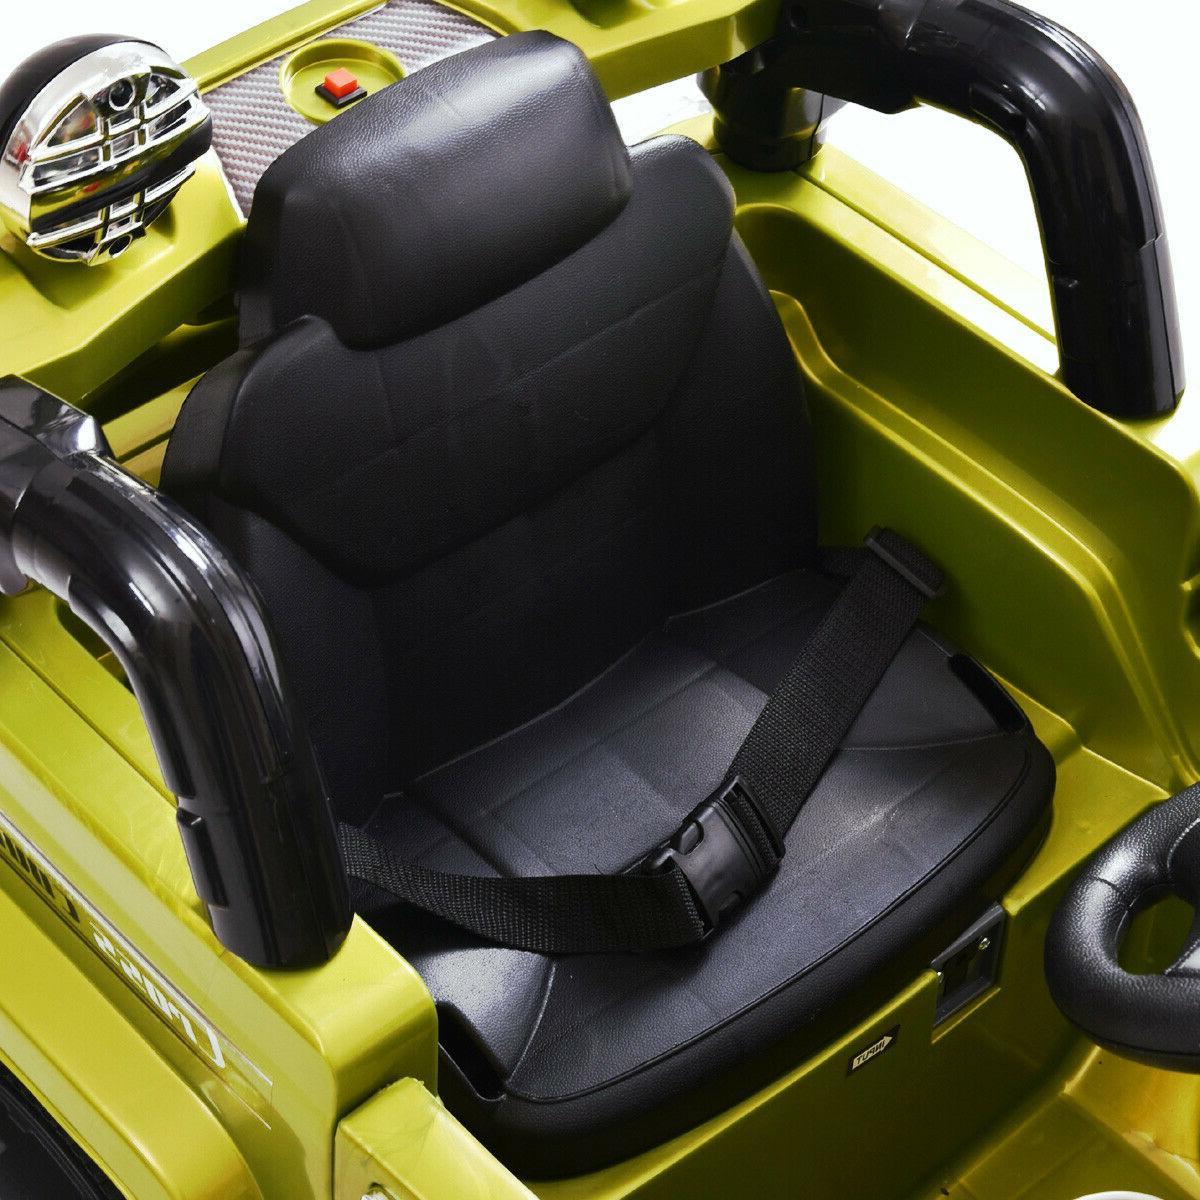 12V RC Power Car Truck Ride W/ Lights Green